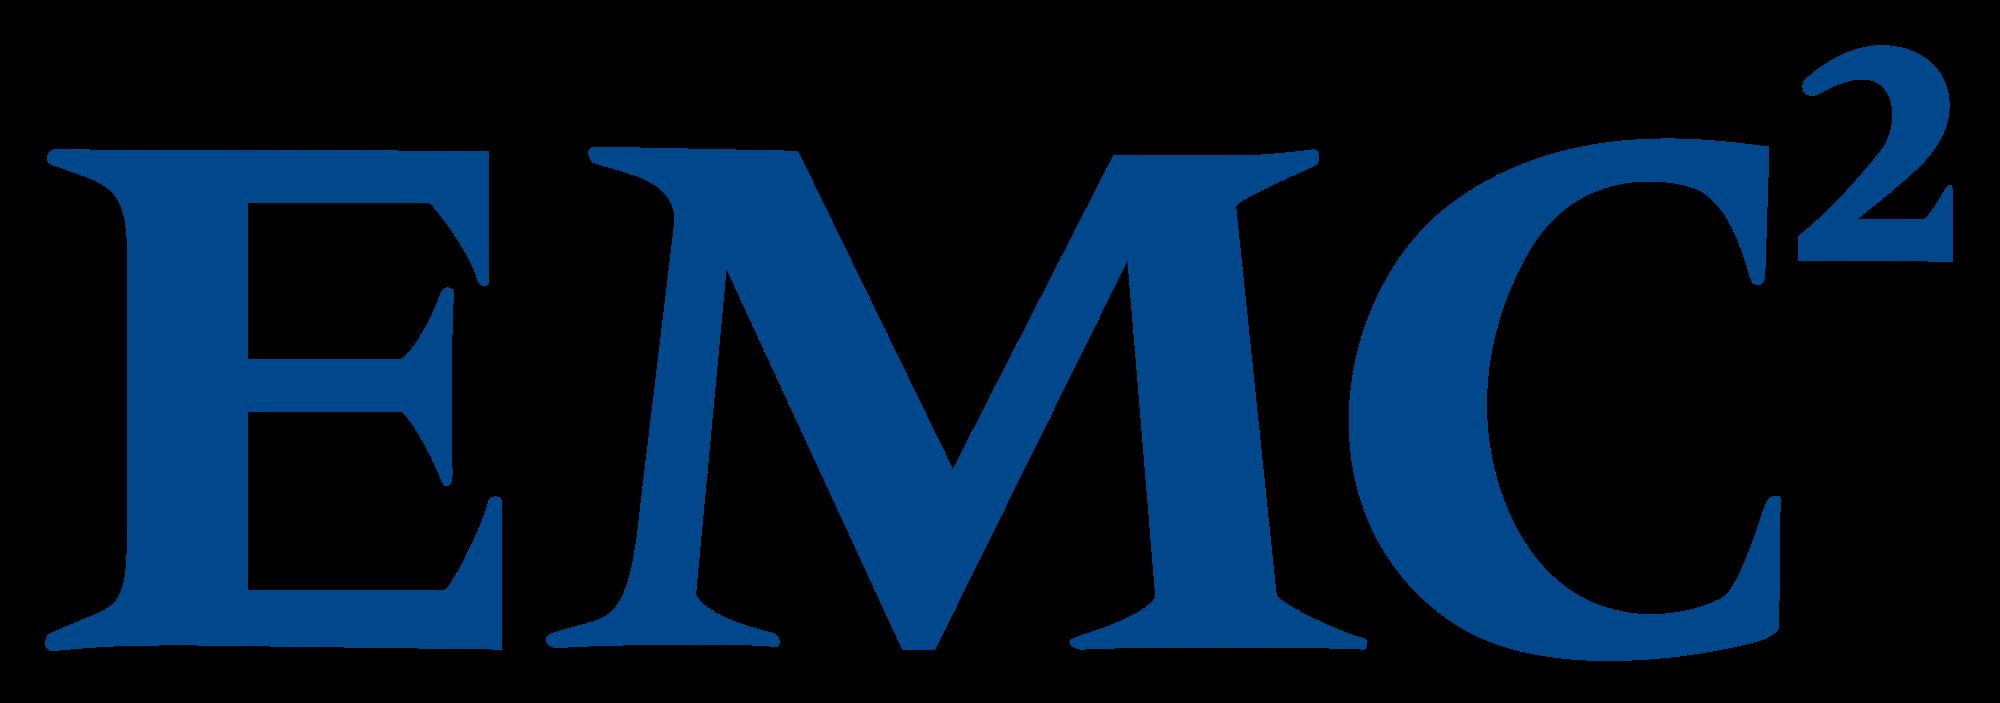 EMC: dati digitali usati efficacemente da una azienda su tre